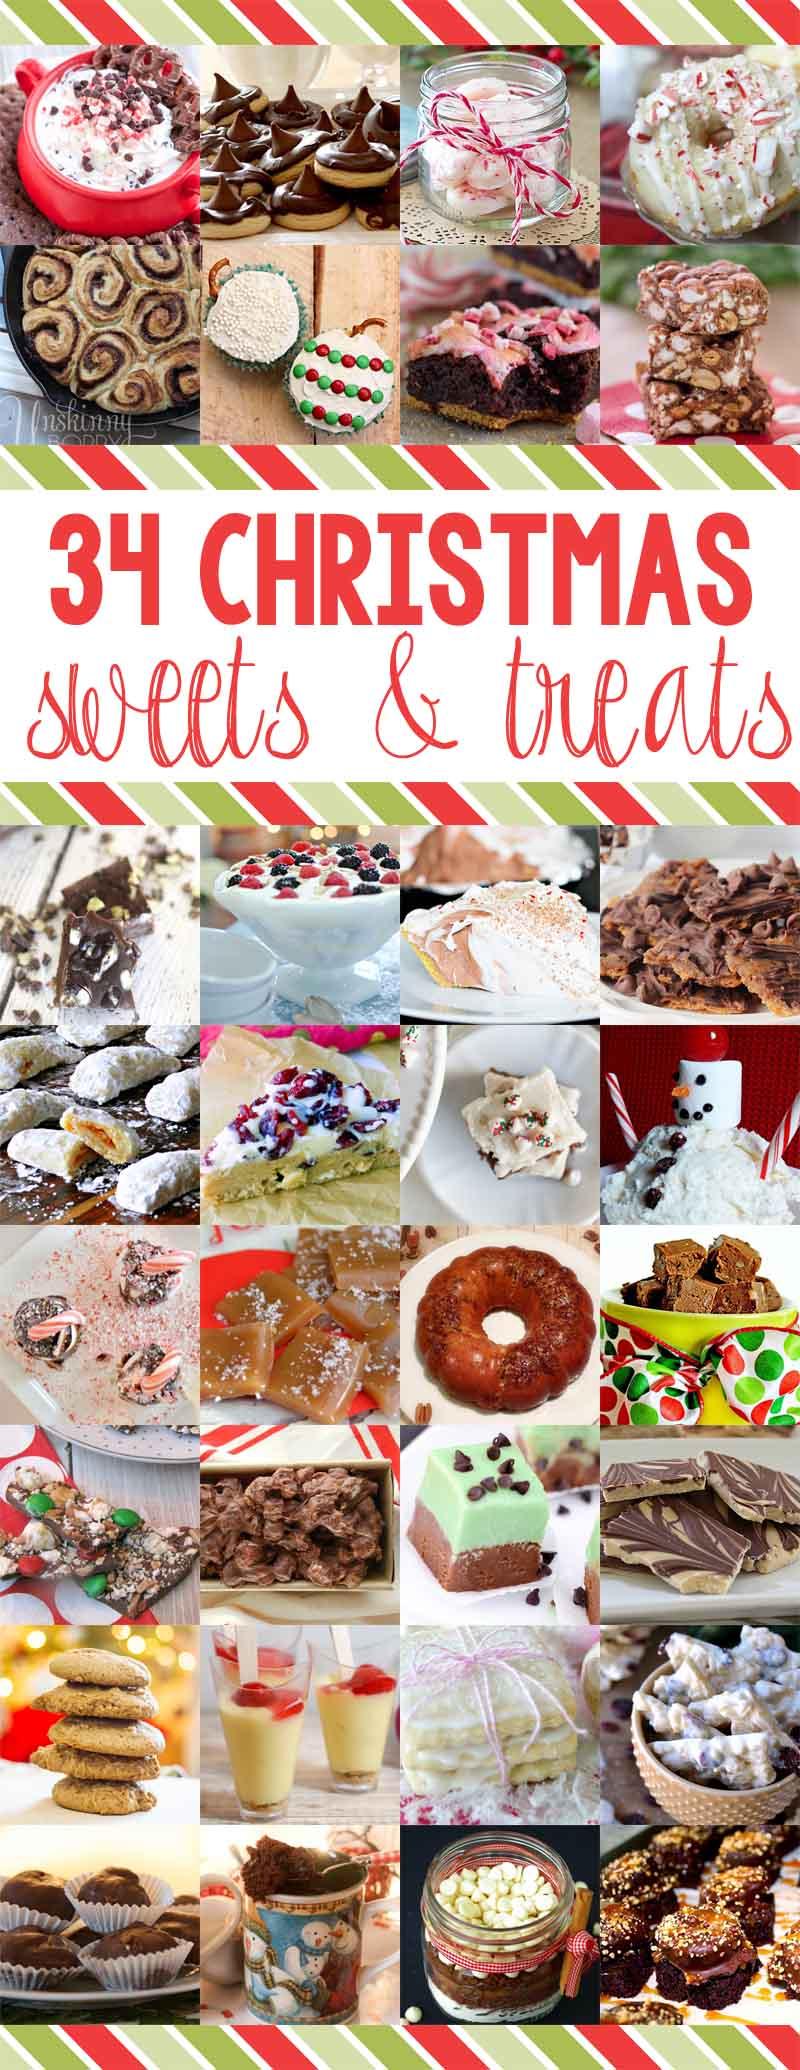 34 Amazing Christmas Dessert Treats You Can Make This Holiday Season